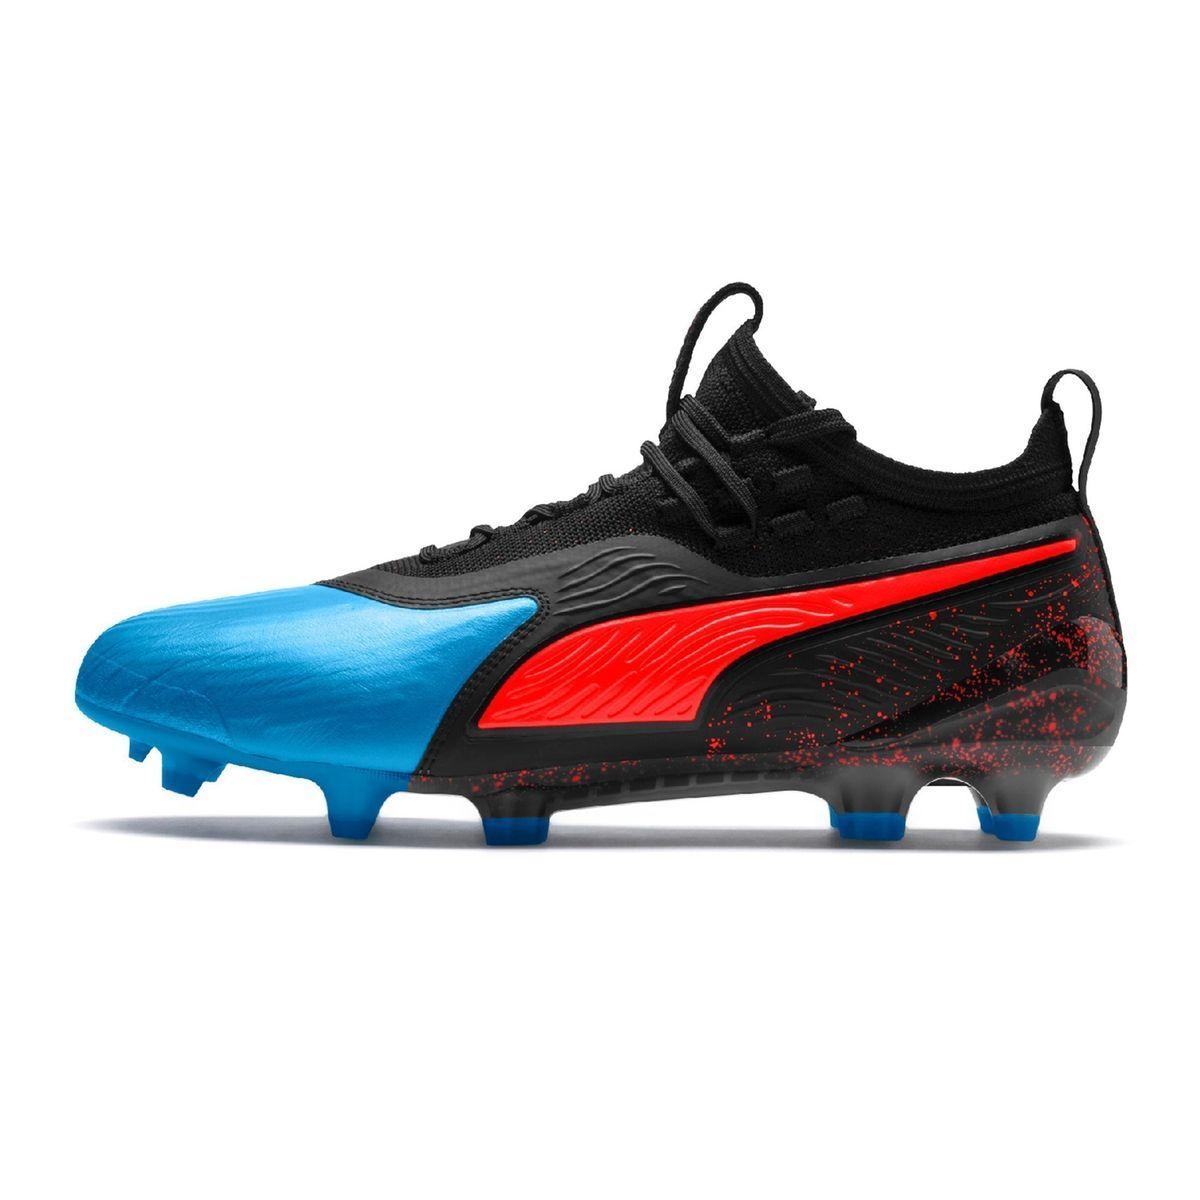 Chaussures Football Puma One 19.1 Fgag bleu Taille : 42